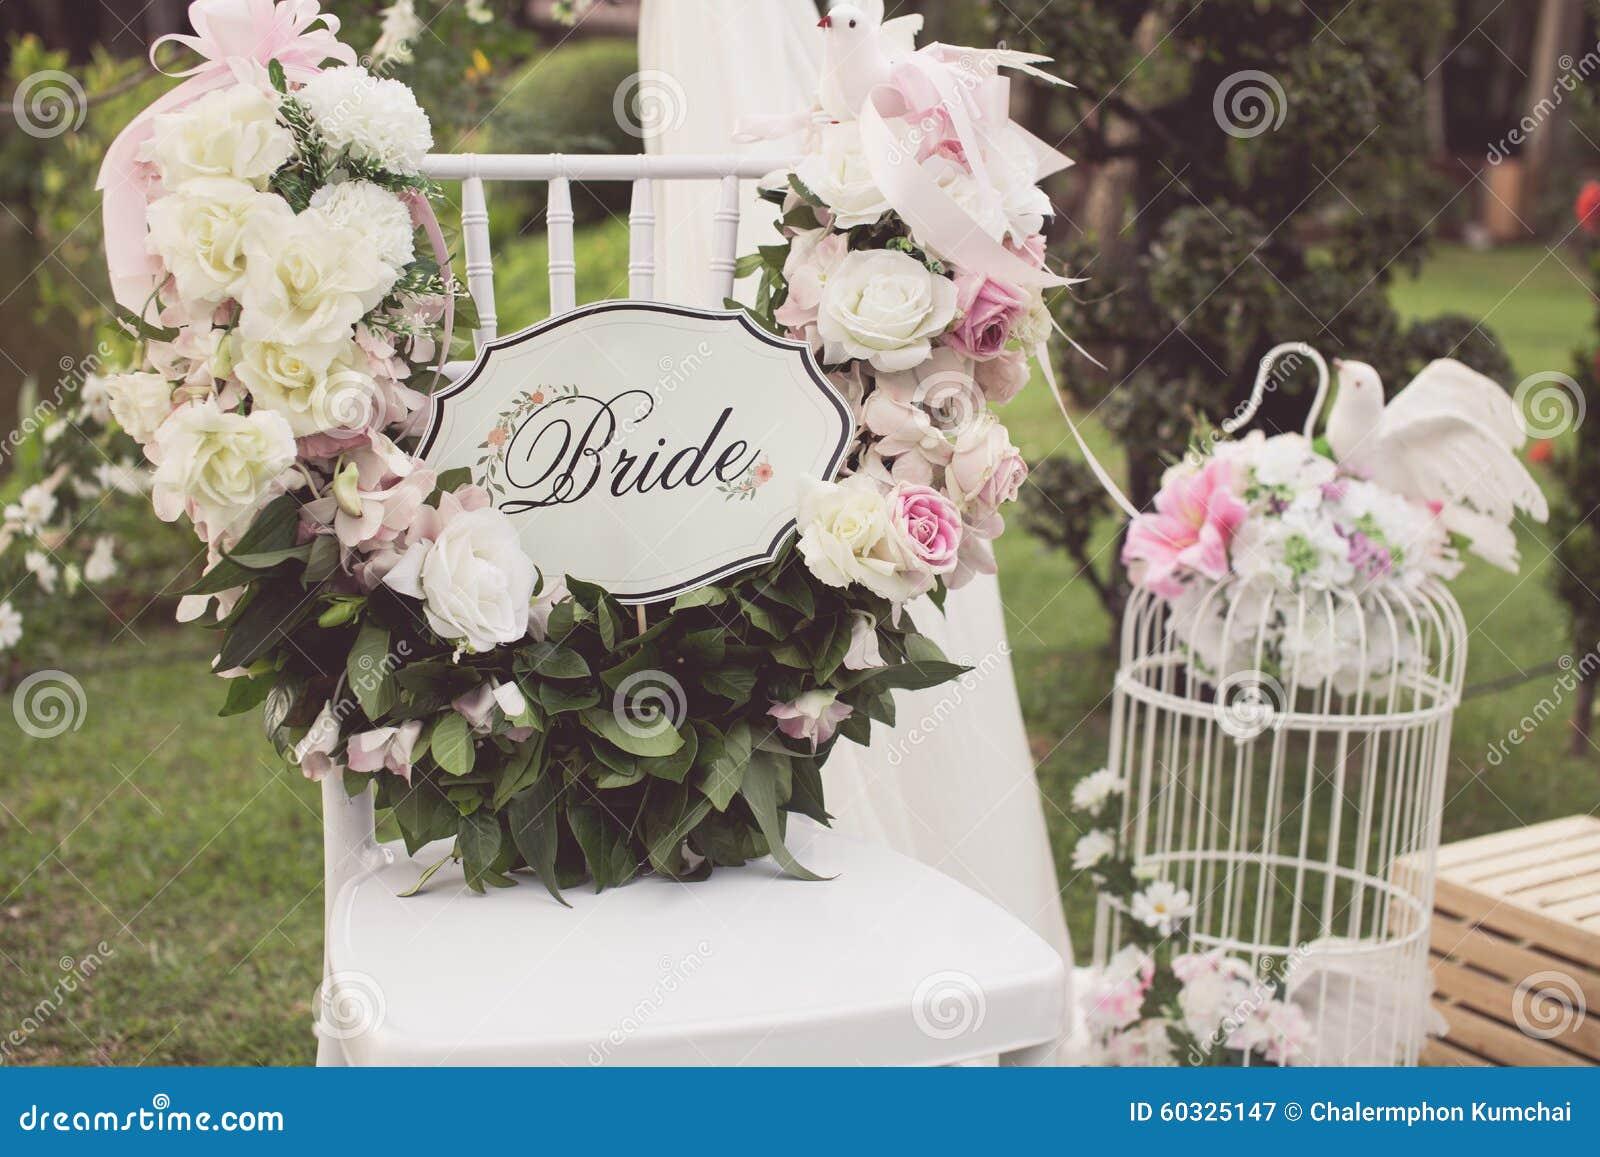 Vintage tone of Wedding chair